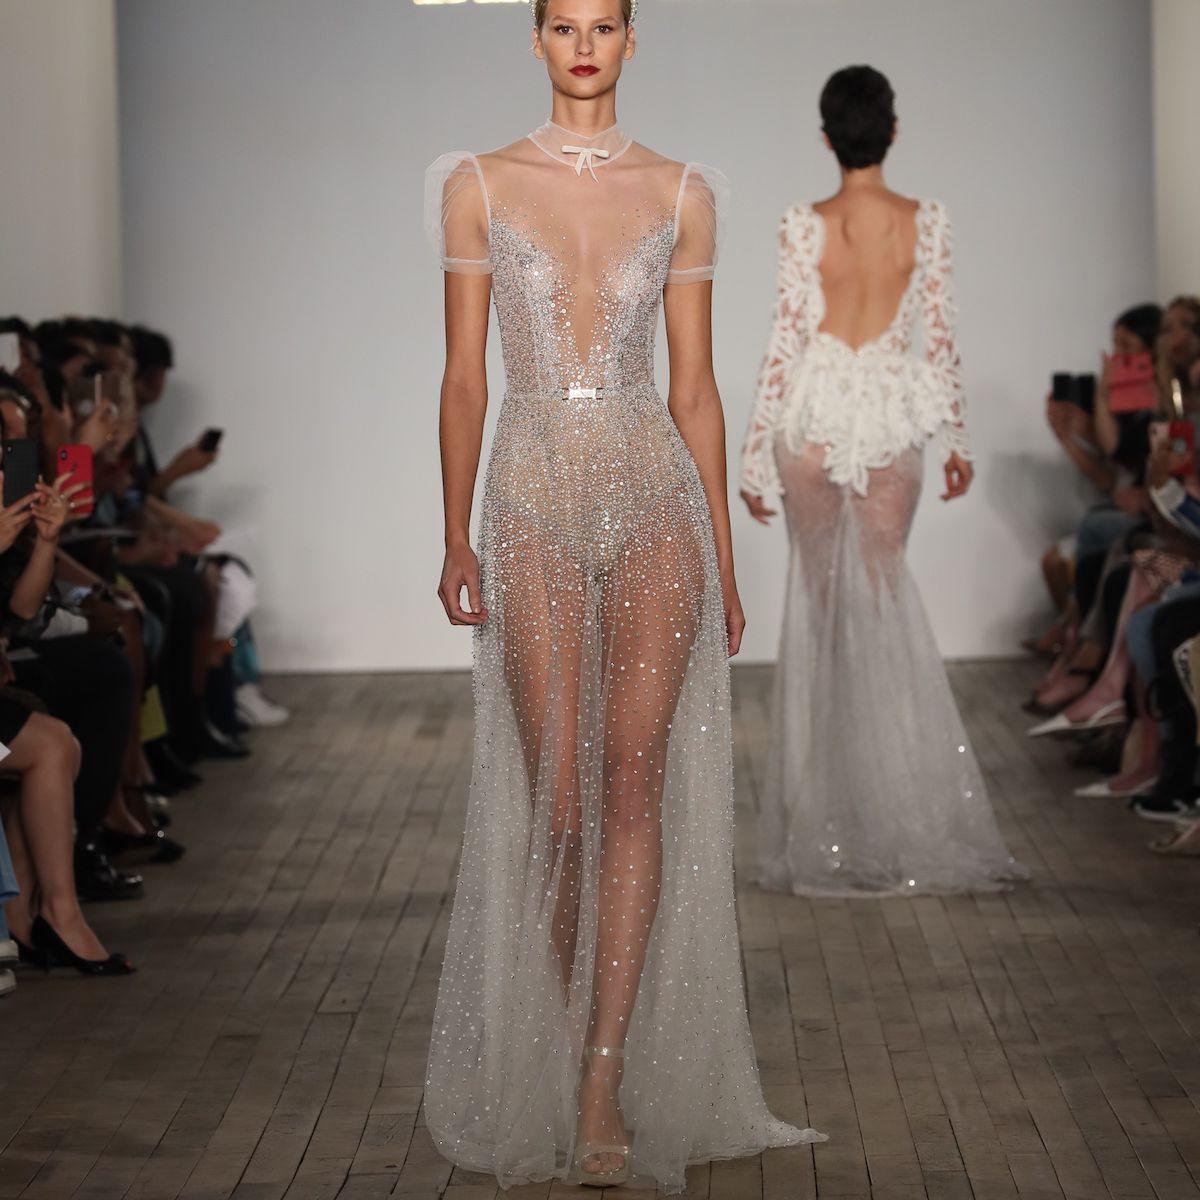 Model in sheer high neck wedding dress